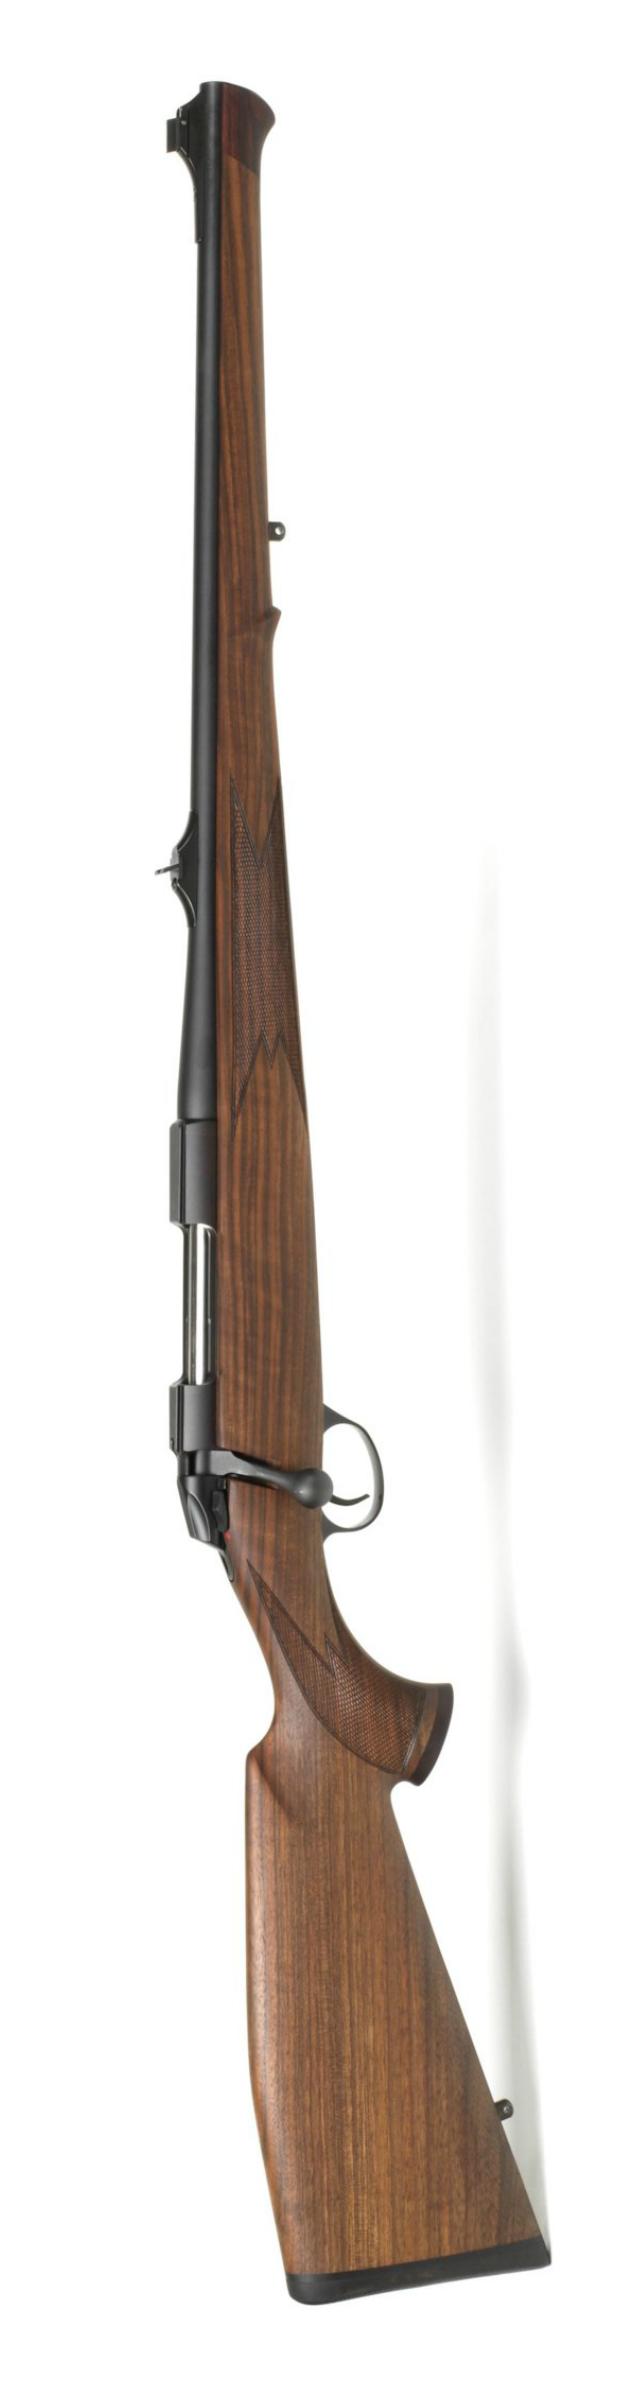 finnish sako 85 firearms pinterest guns firearms and hunting